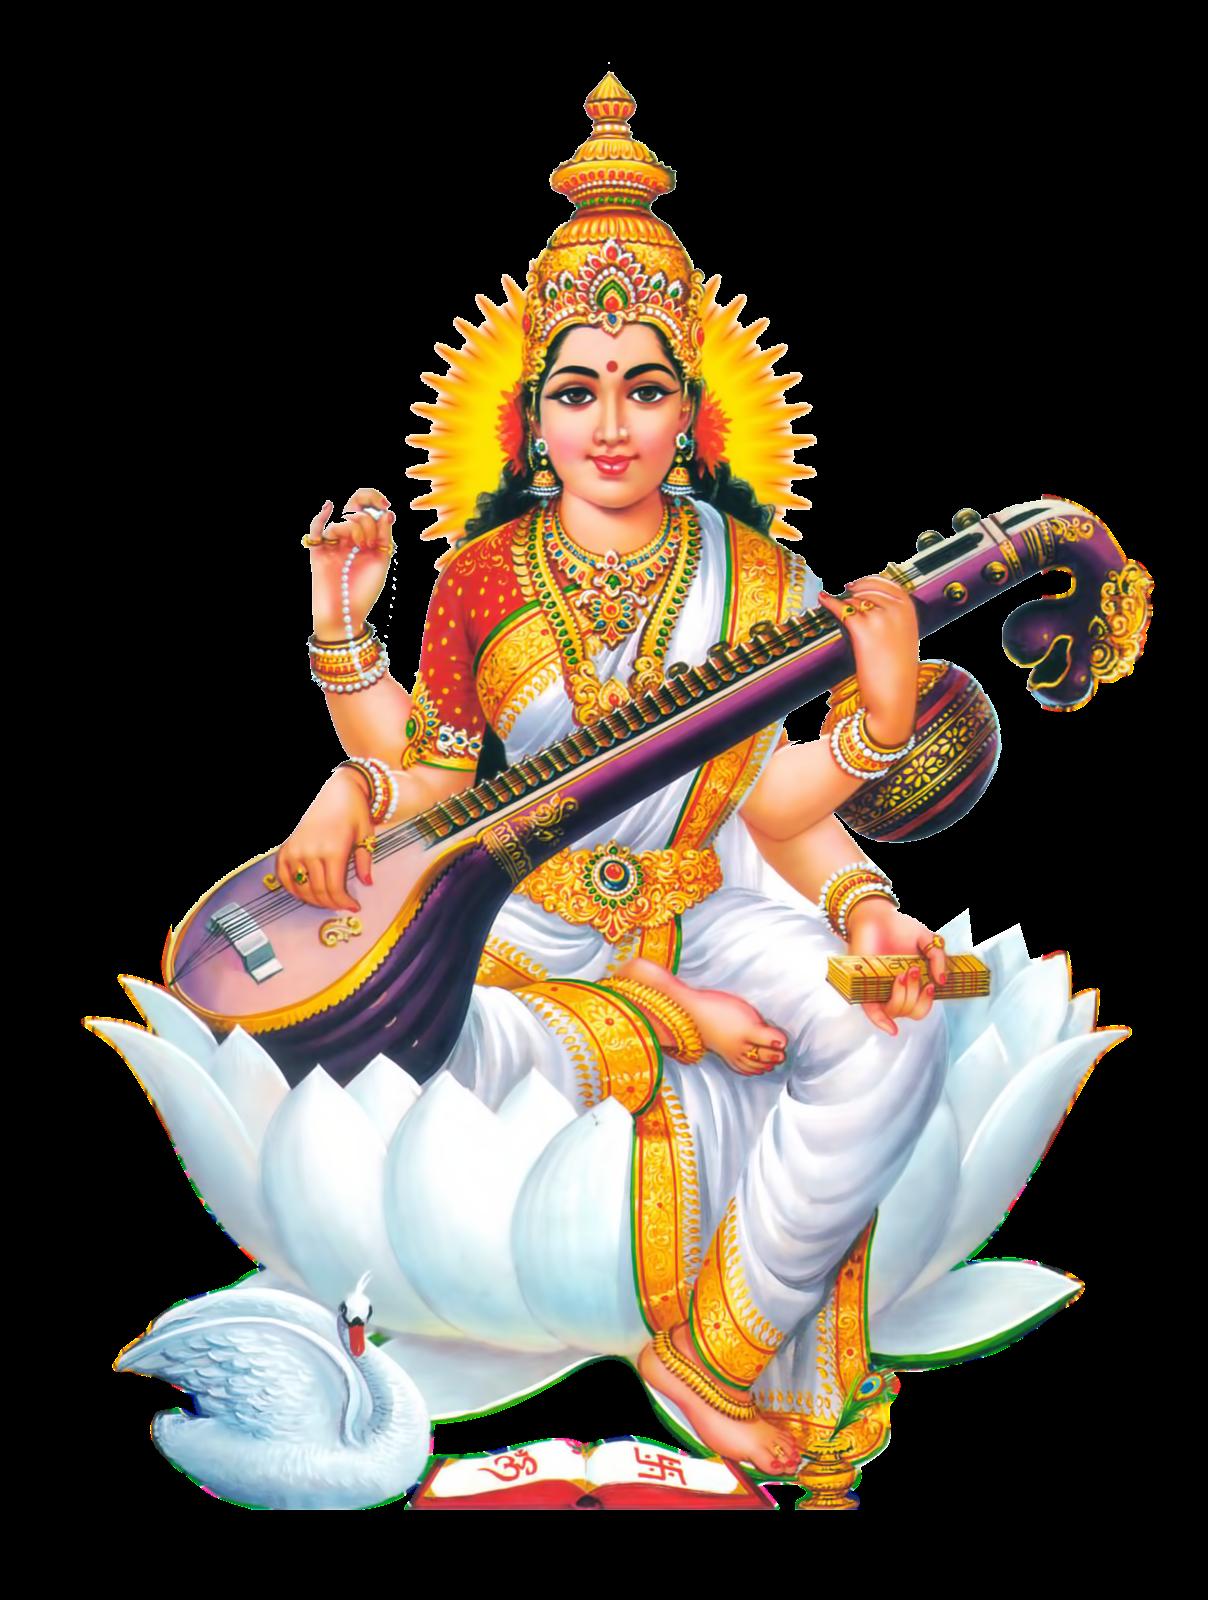 Goddess-Saraswati-Free-HD-PNG-vector-photo-images- - Saraswati HD PNG